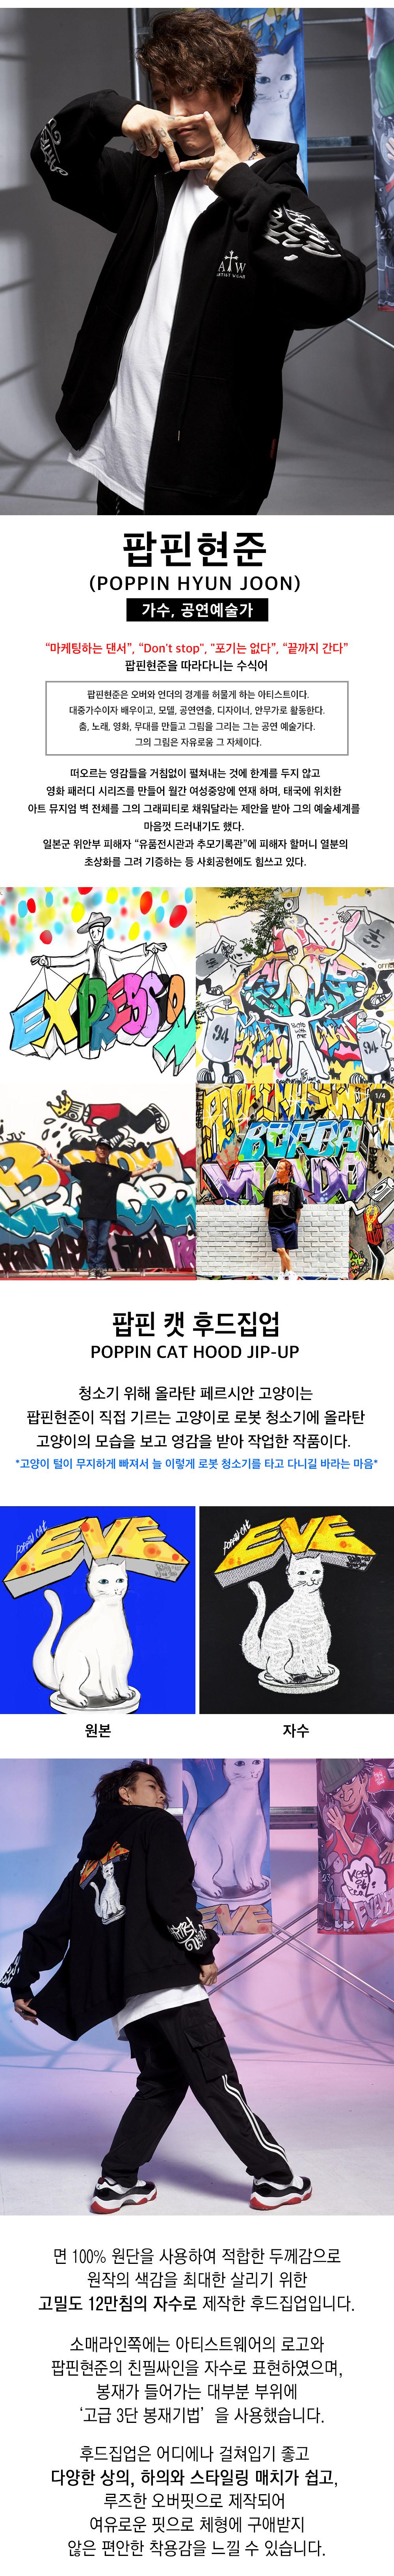 POPPIN-CAT-HOOD-ZIP-UP_01.jpg